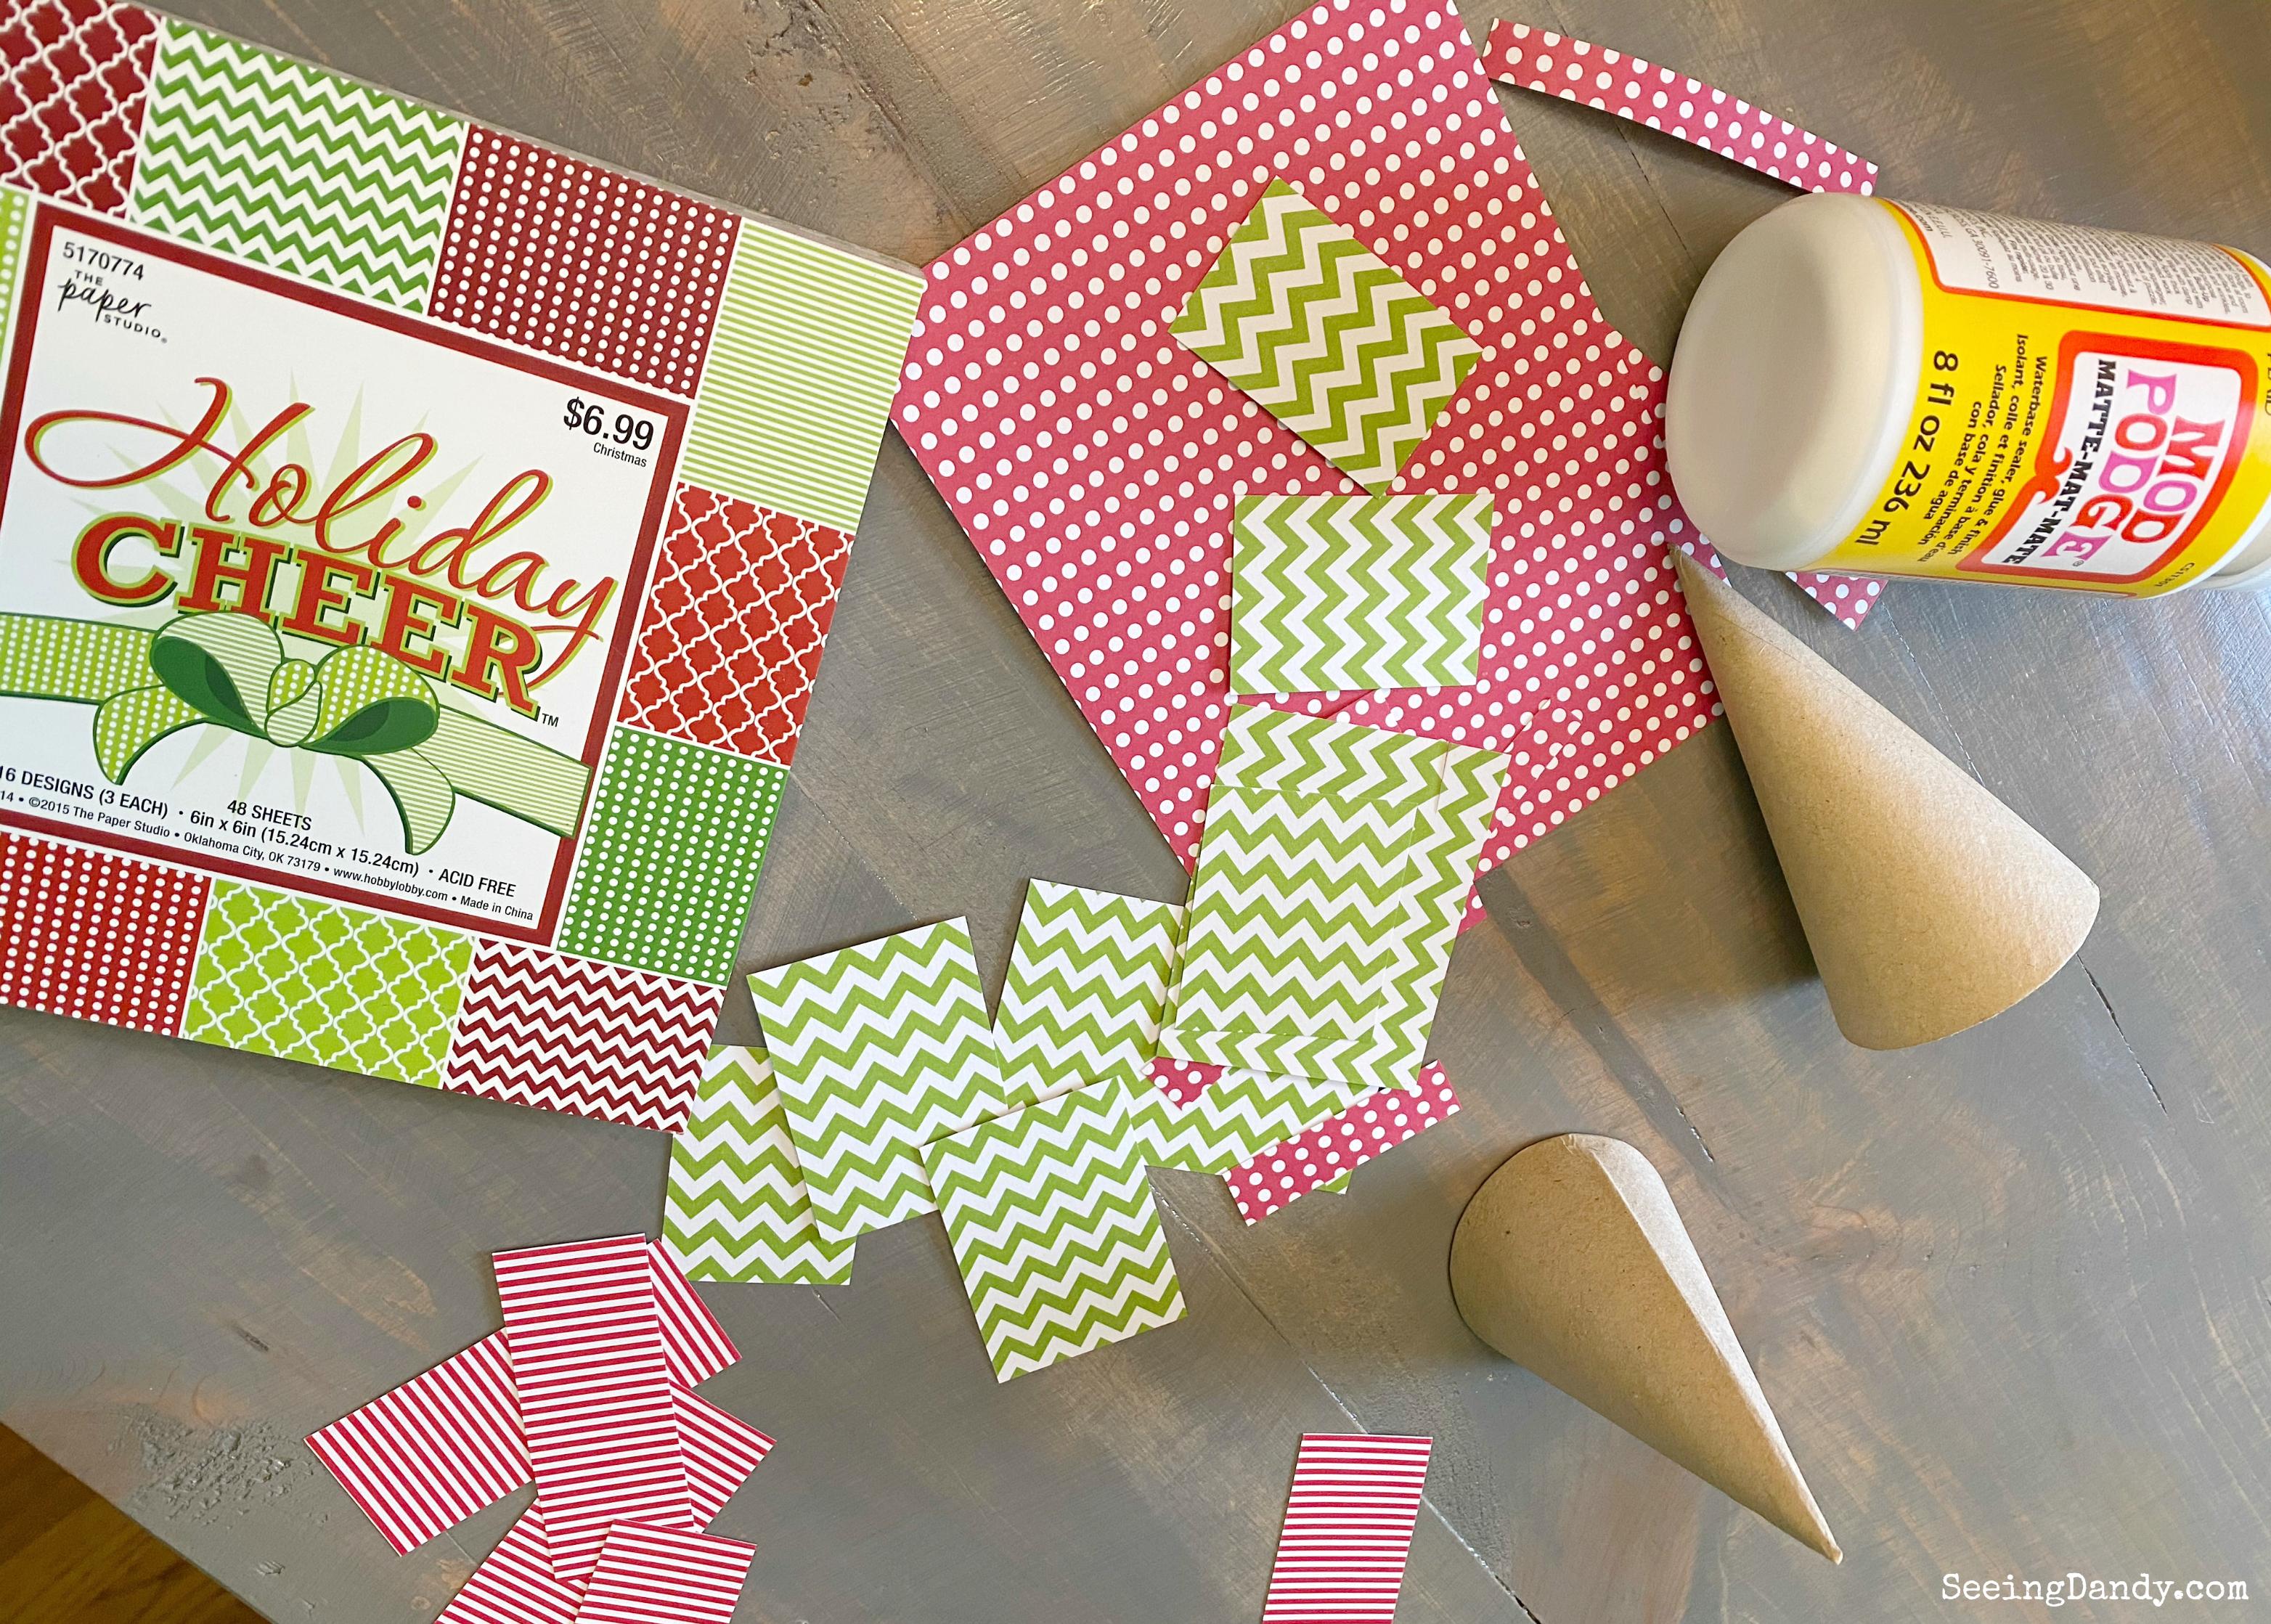 Christmas scrapbook paper Mod Podge cardboard Christmas trees